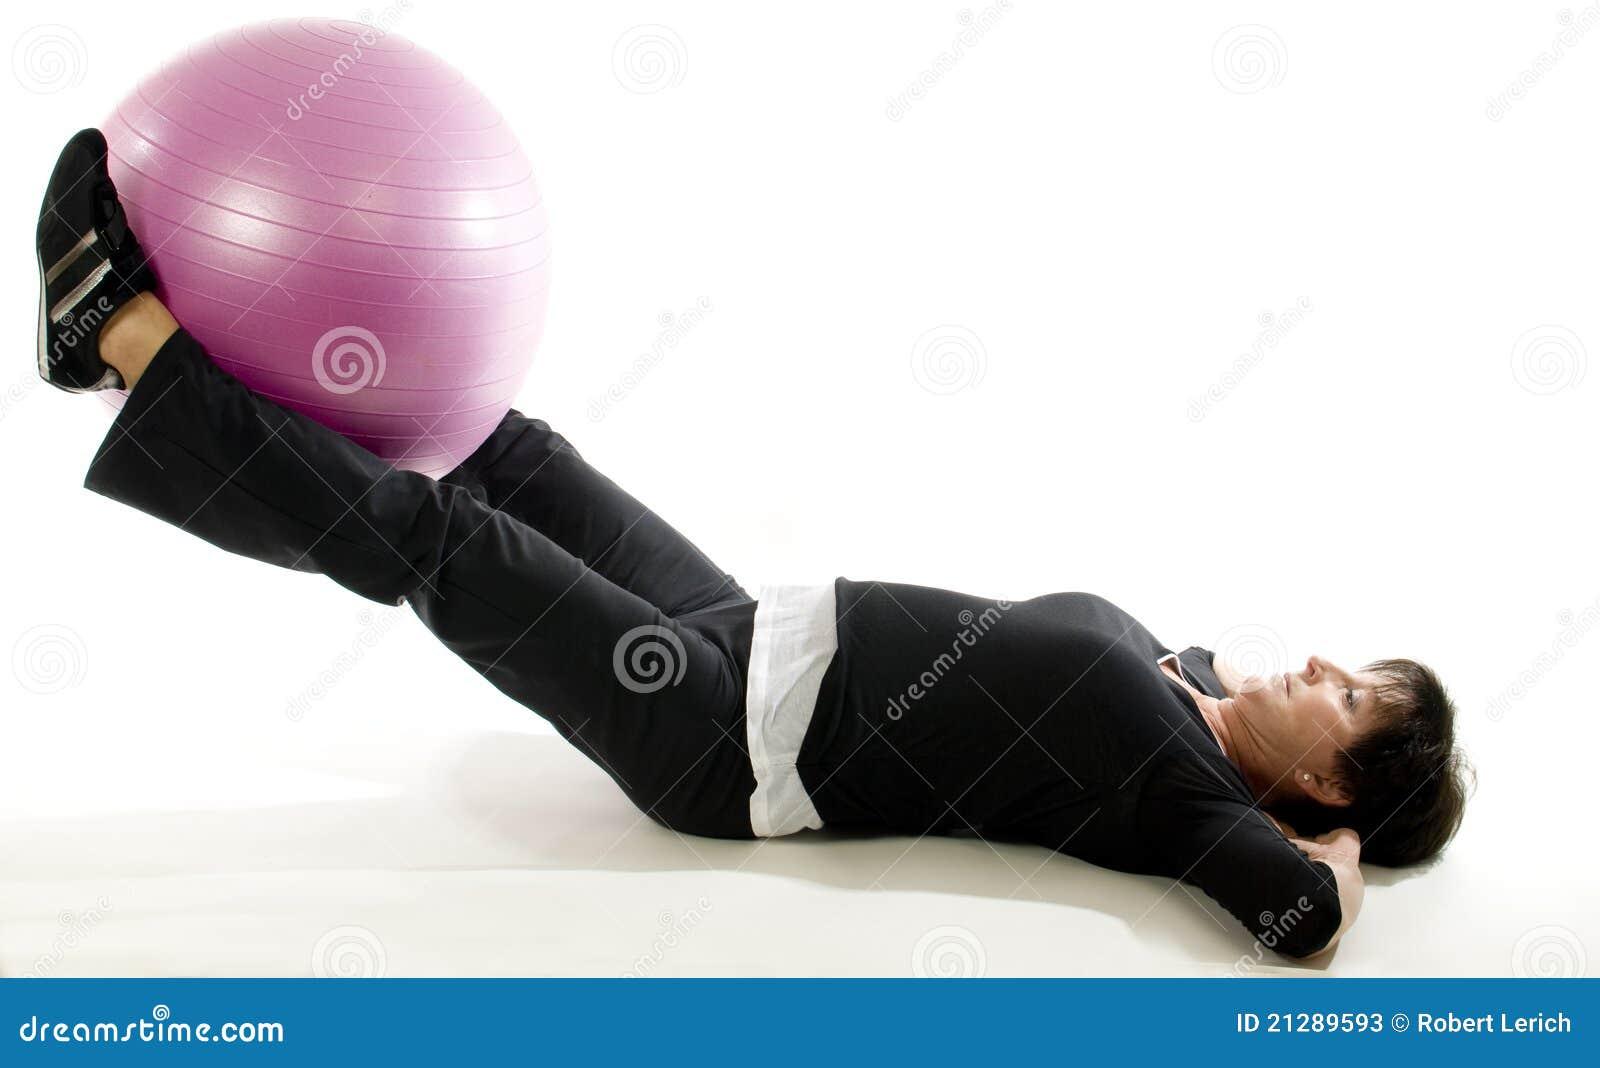 Woman fitness exercise leg raise training ball